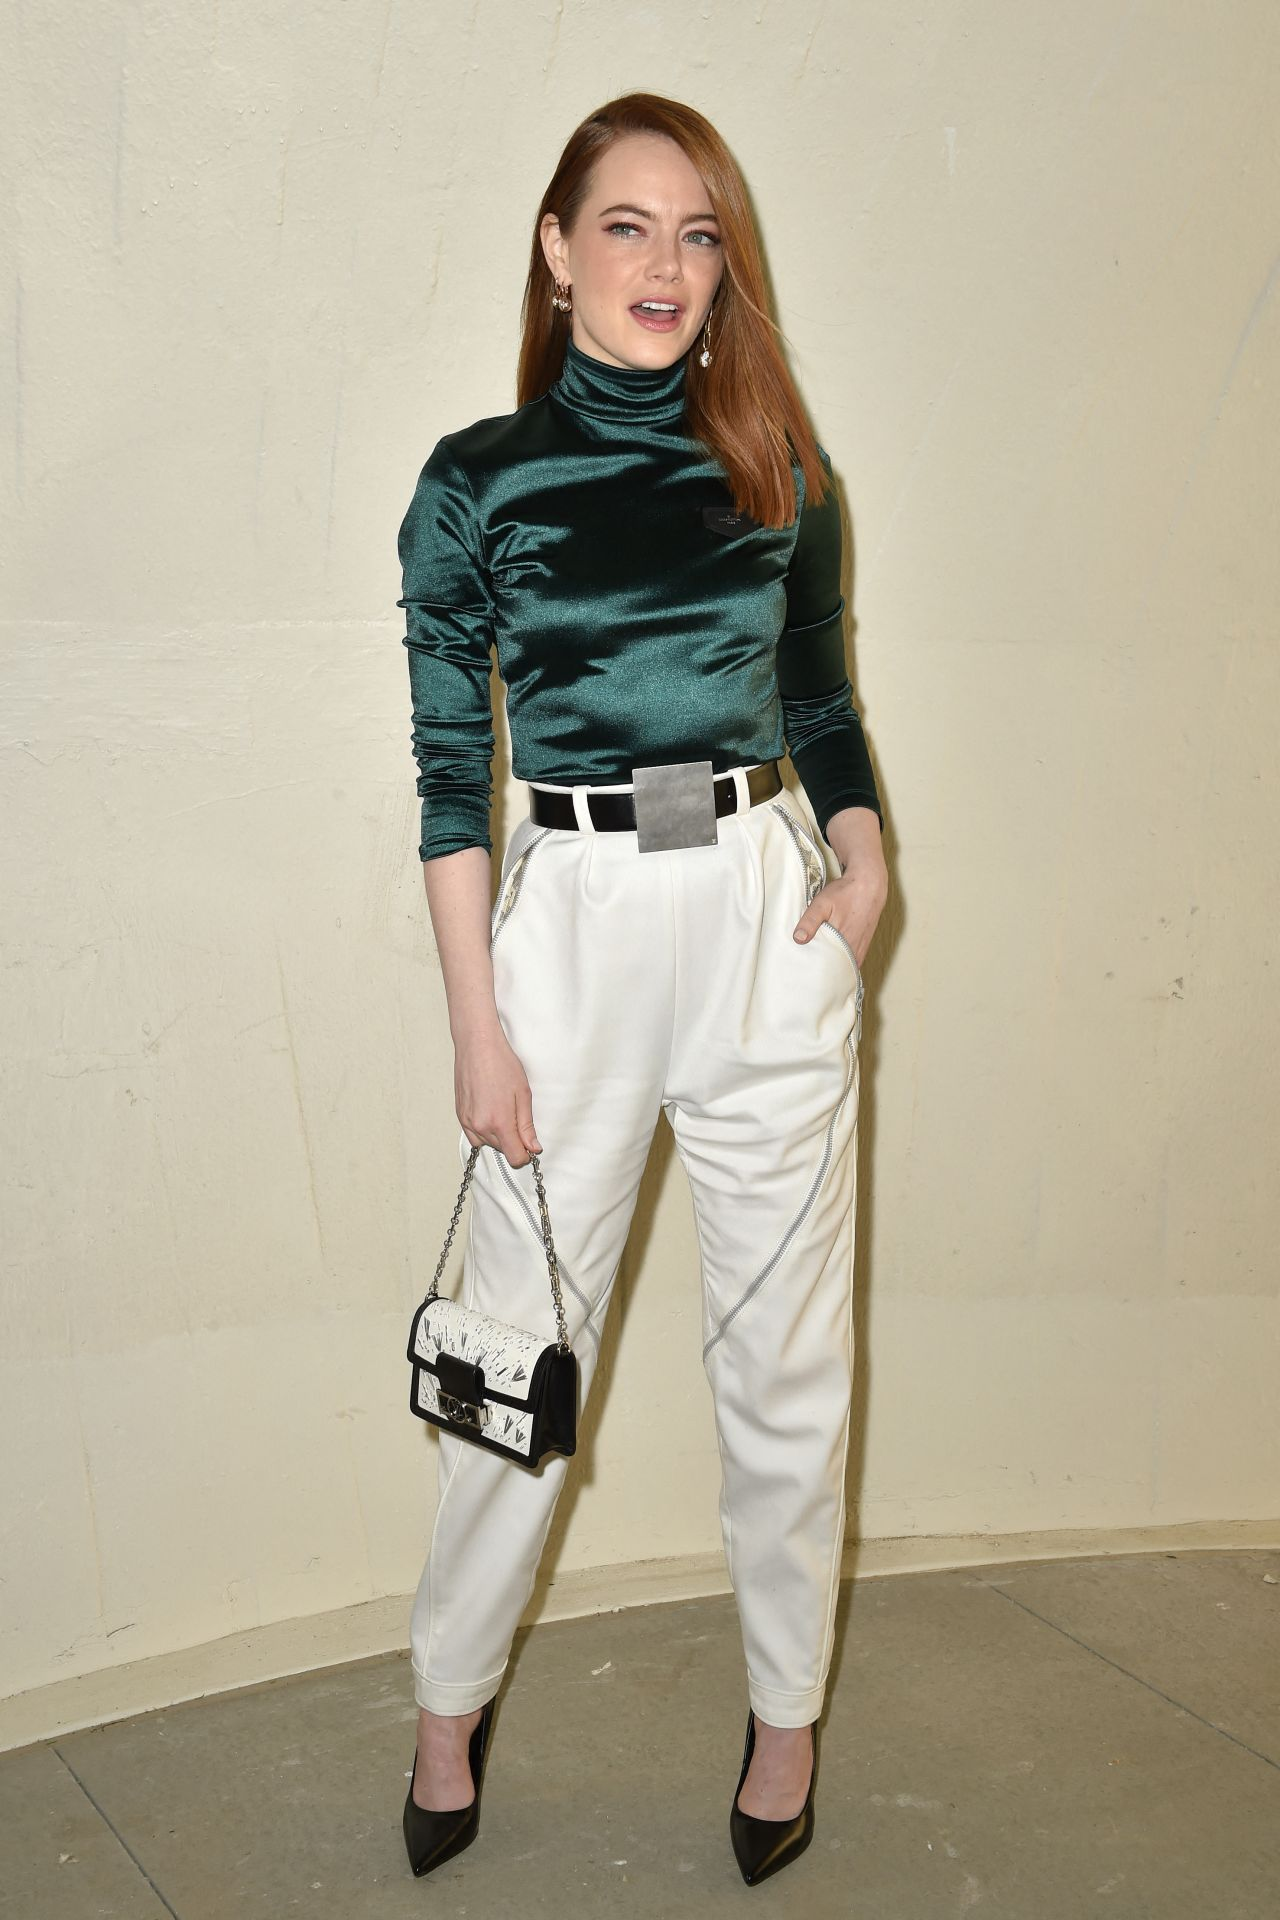 Emma Stone Louis Vuitton Cruise 2020 Fashion Show In Nyc